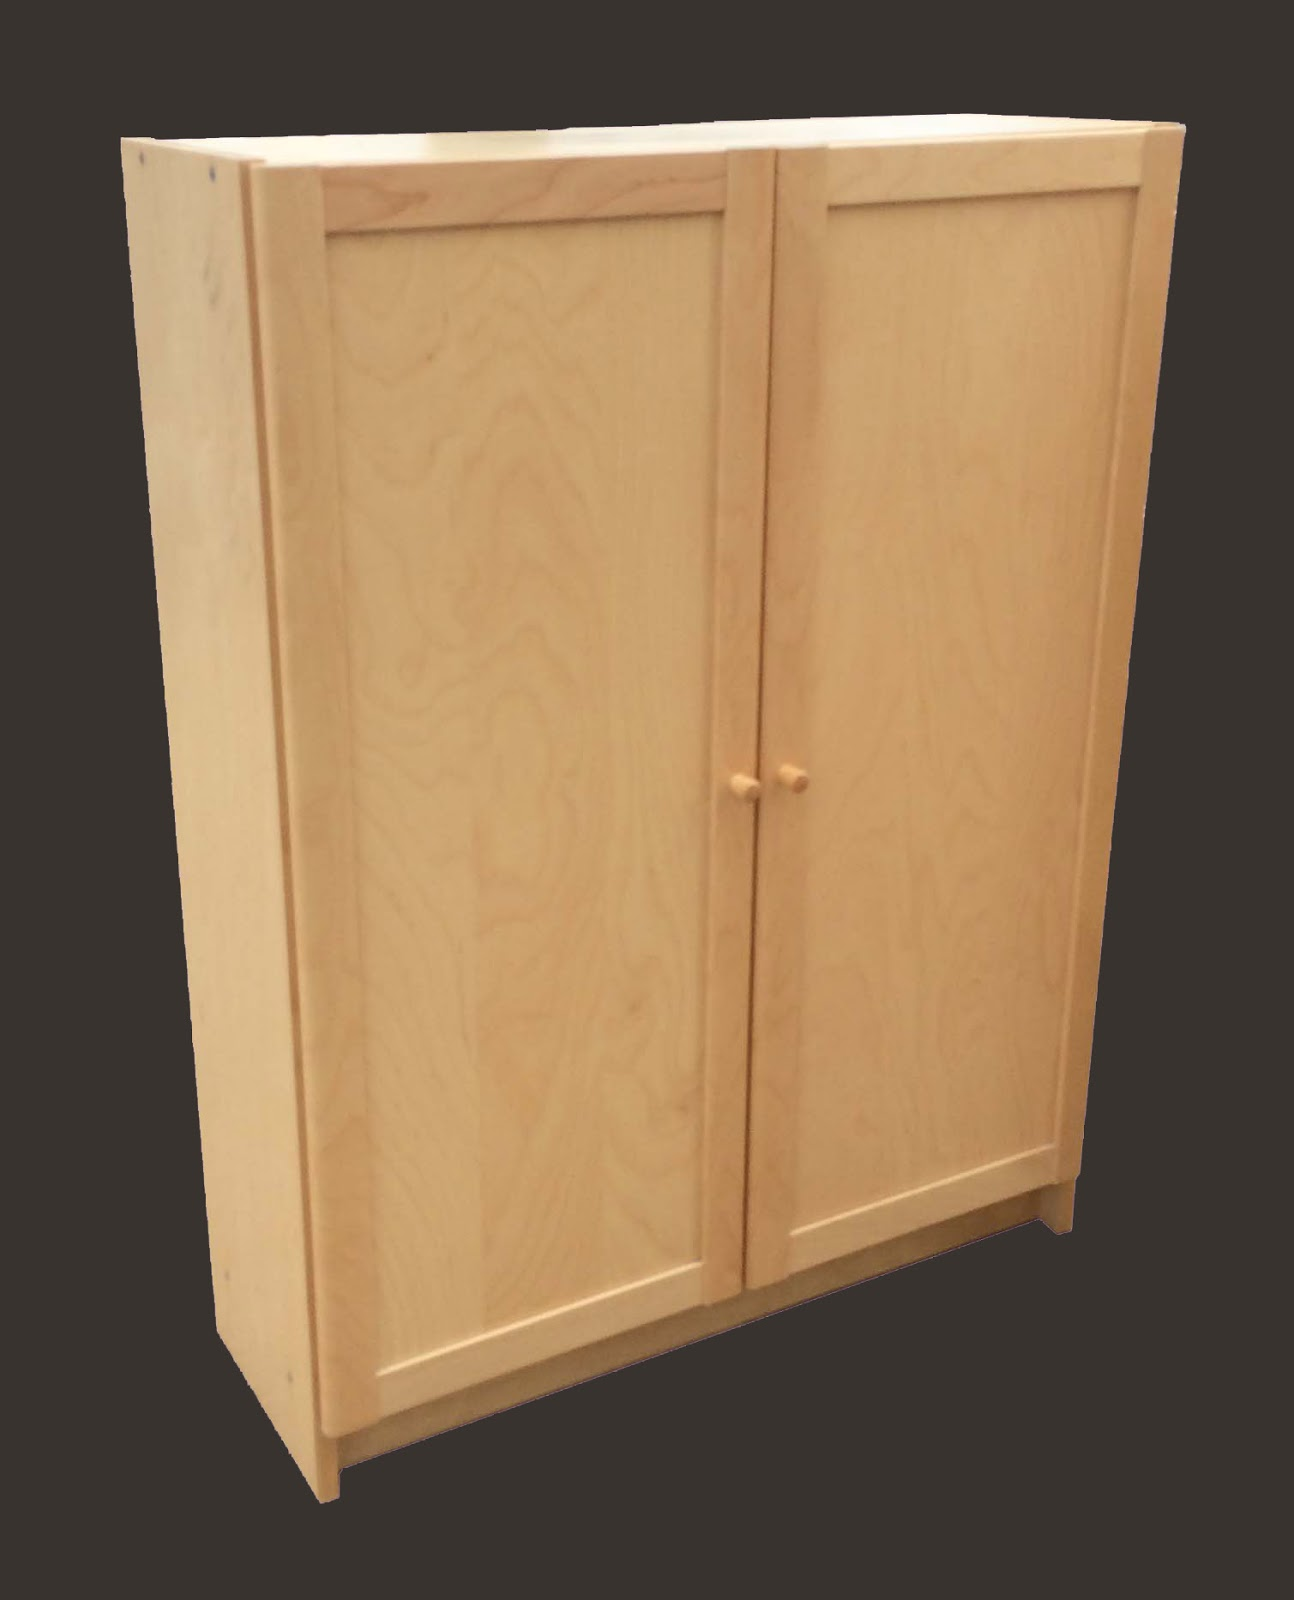 uhuru furniture collectibles cabinet with shelves. Black Bedroom Furniture Sets. Home Design Ideas